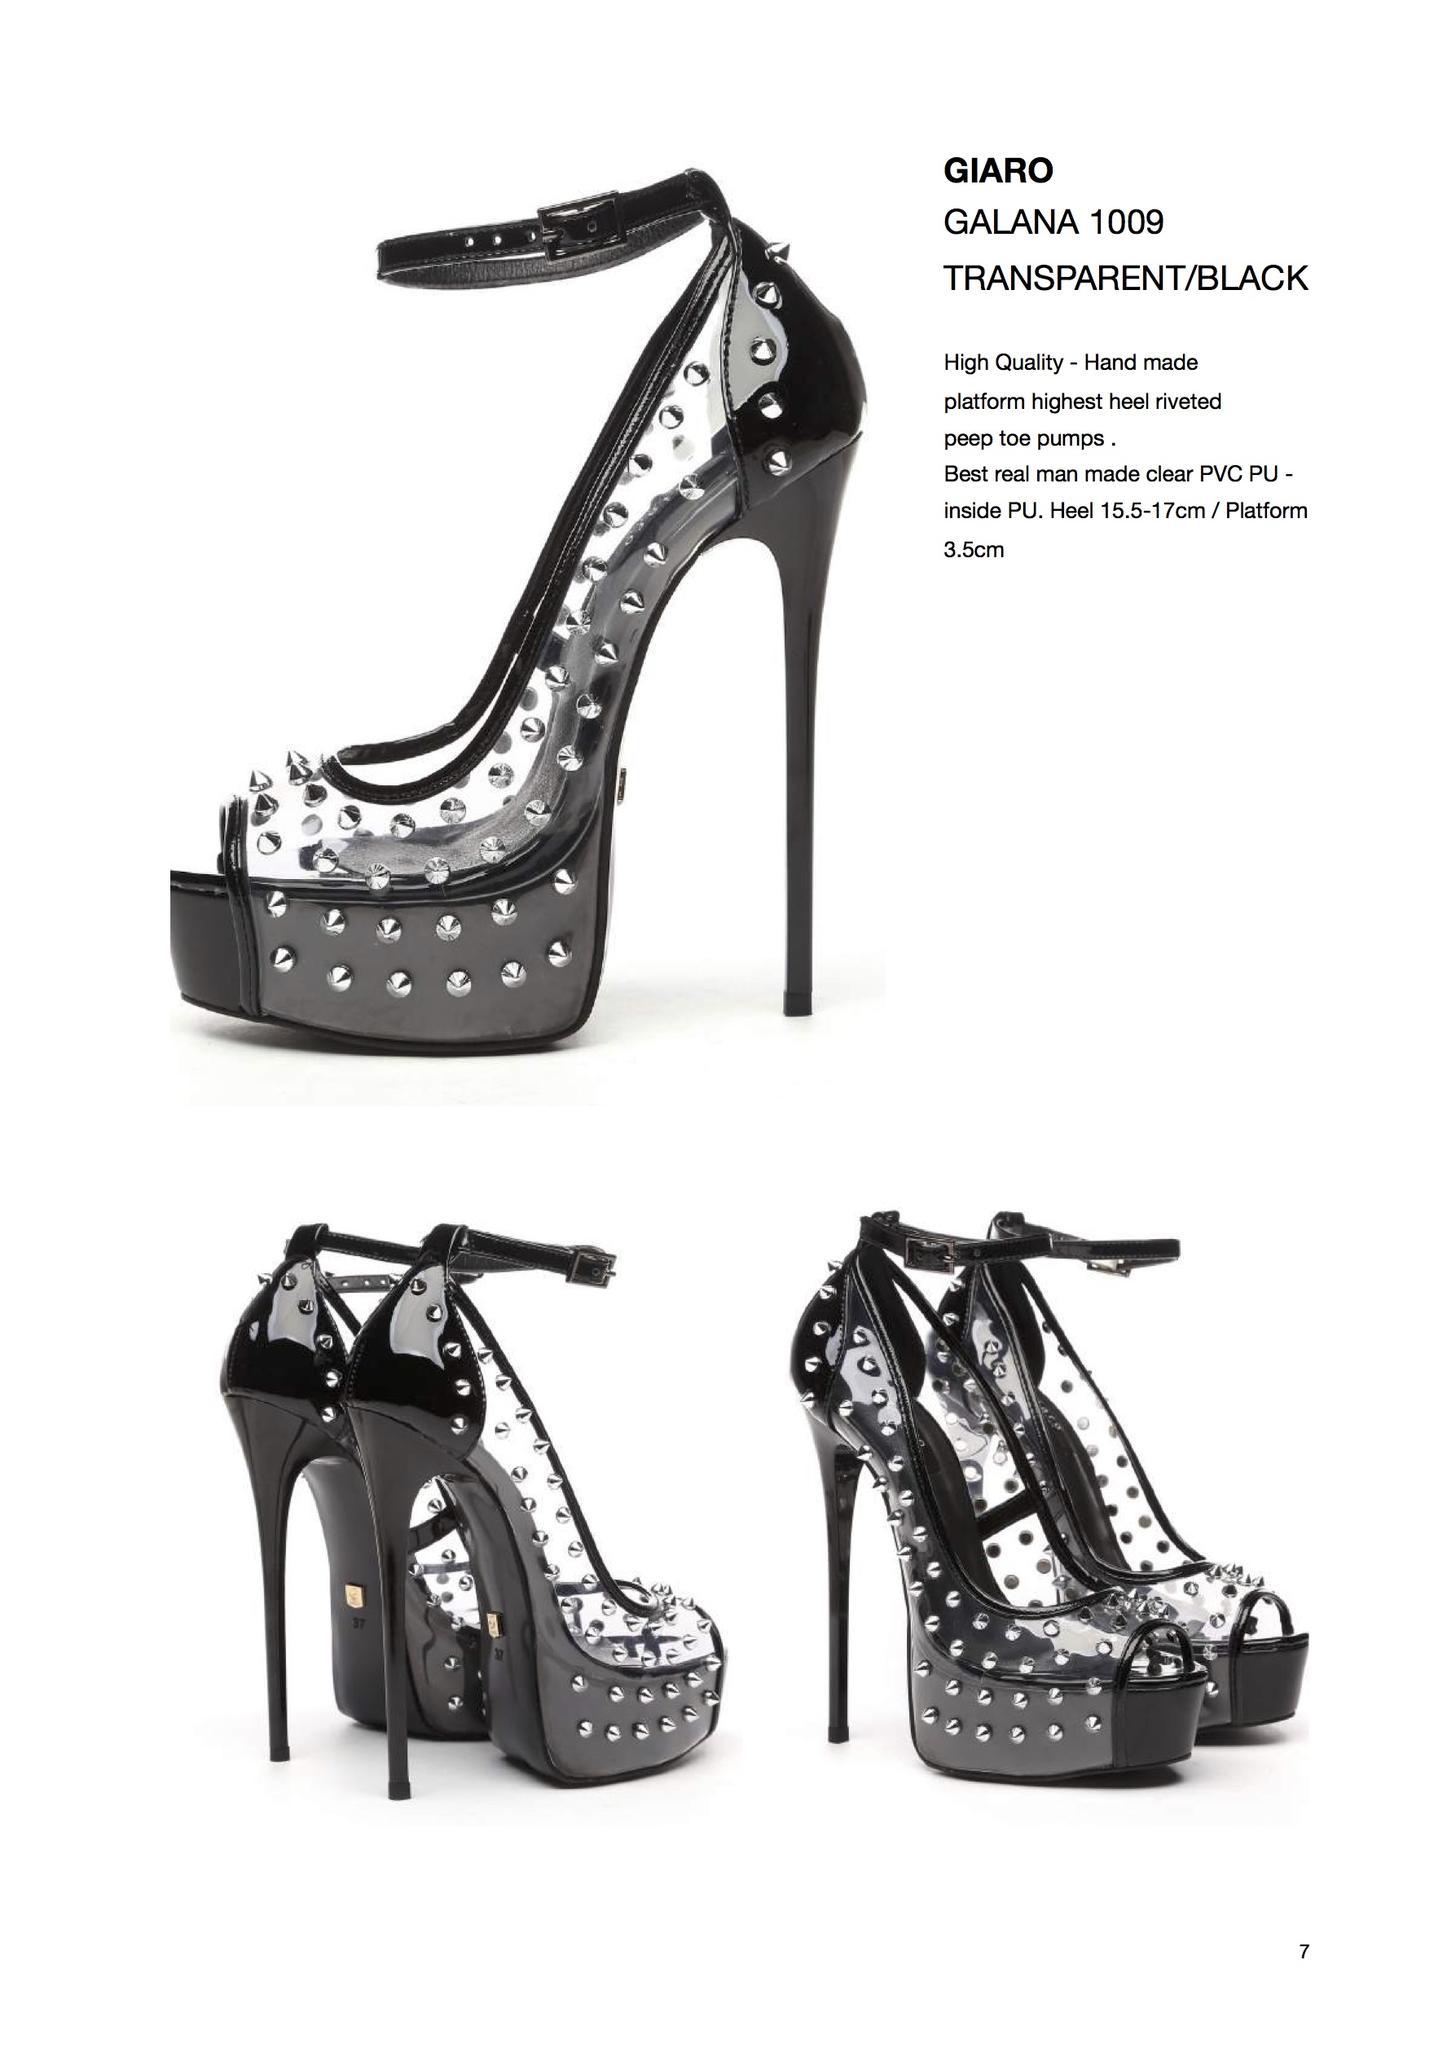 8f87bb574b70 New summer 2017 Giaro high heels - Shoebidoo Shoes